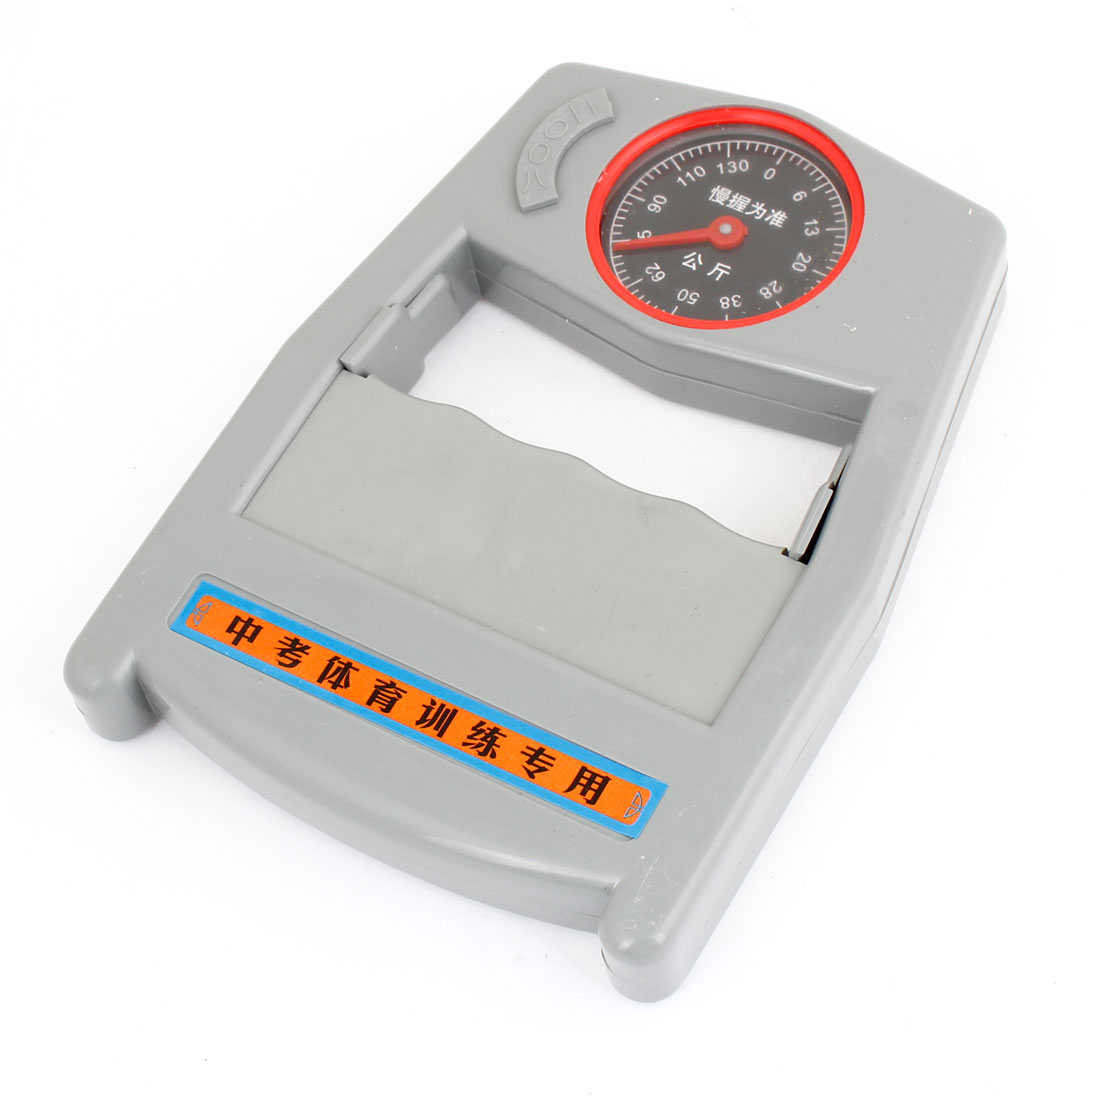 Portable Grip Dynamometer for Grip Strength Measurement 0-130Kg/286Lbs Range